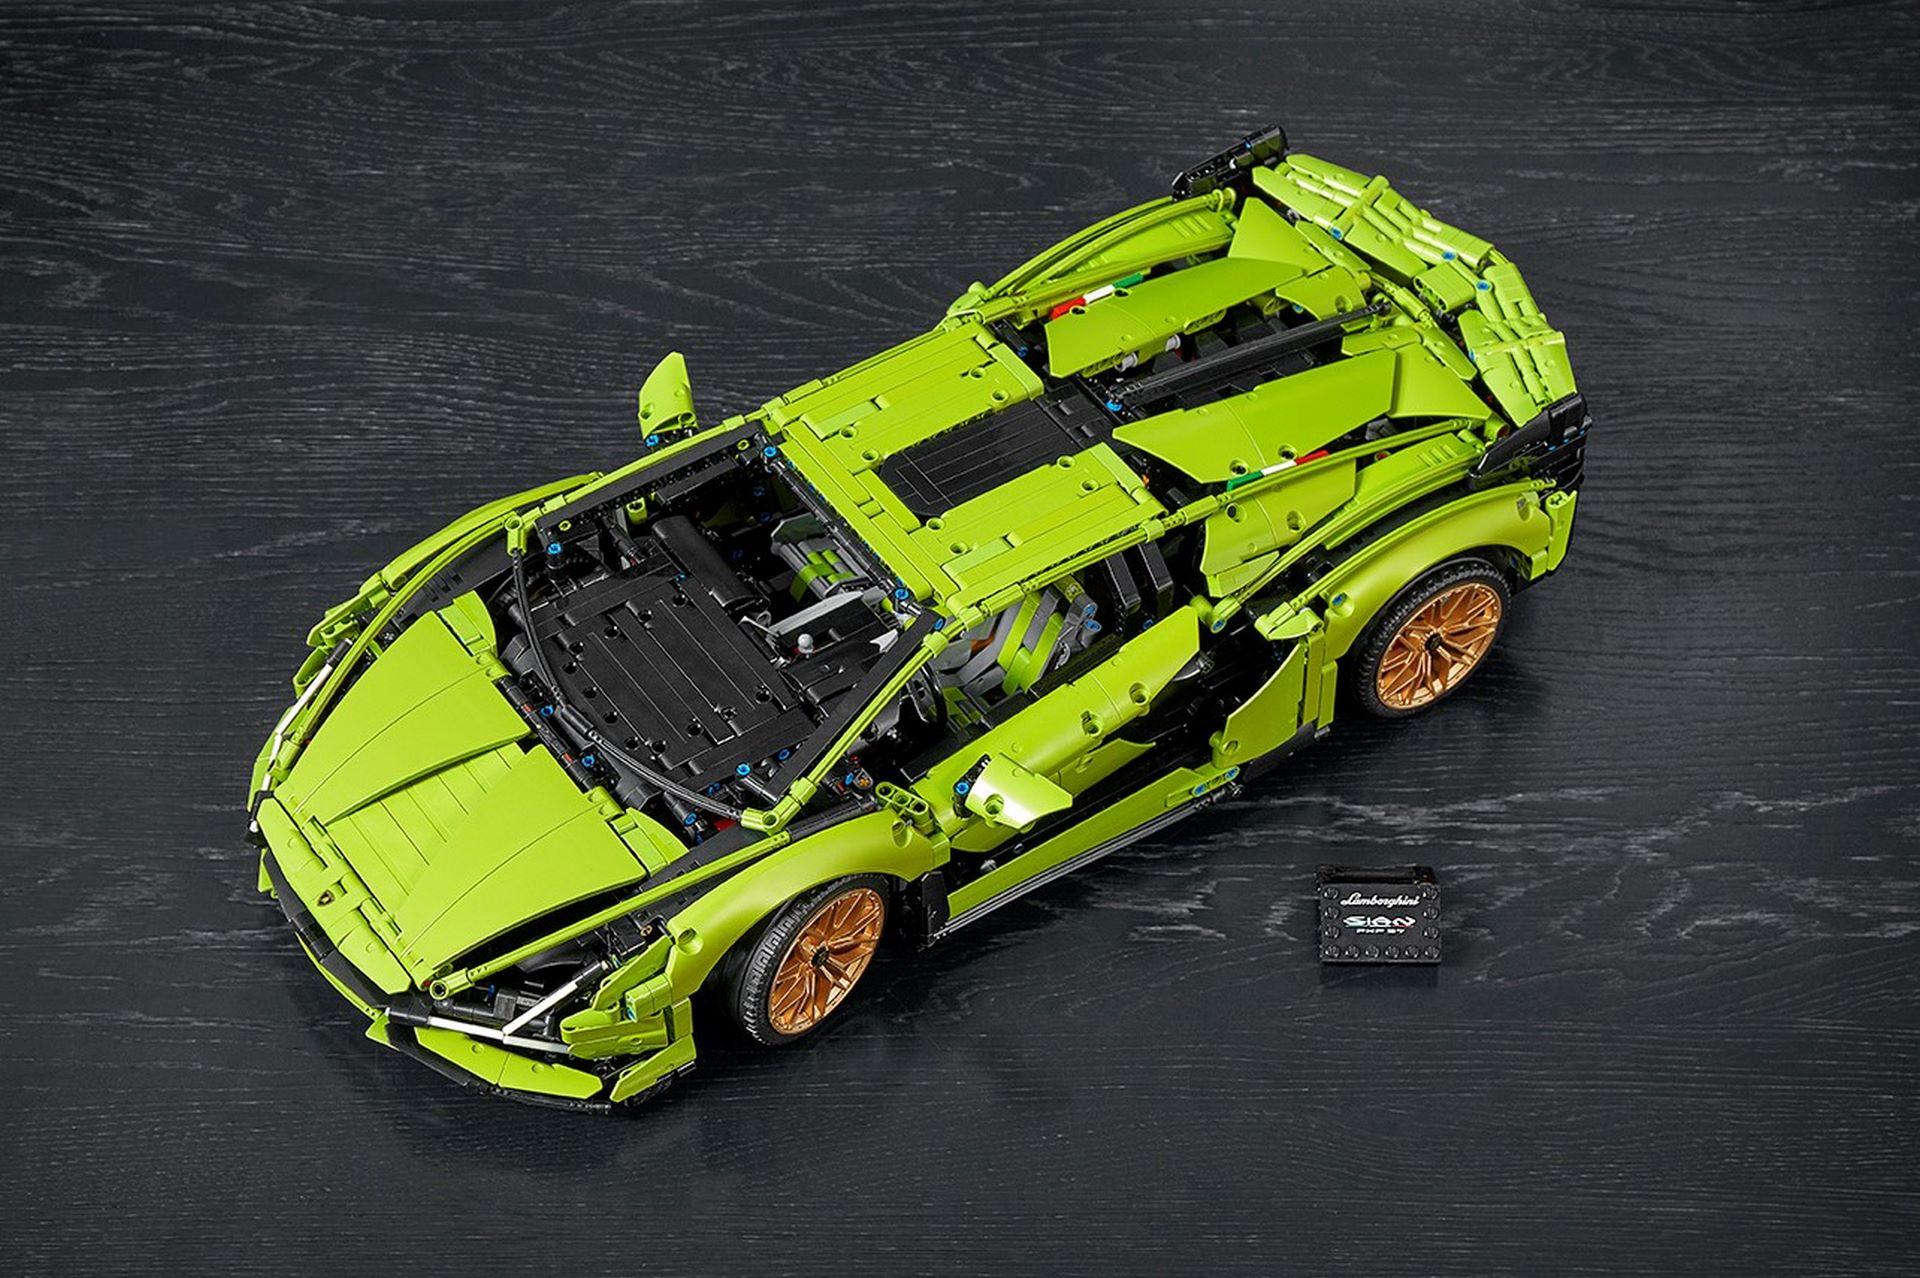 Lamborghini-Sian-FKP-37-Lego-Technic-4